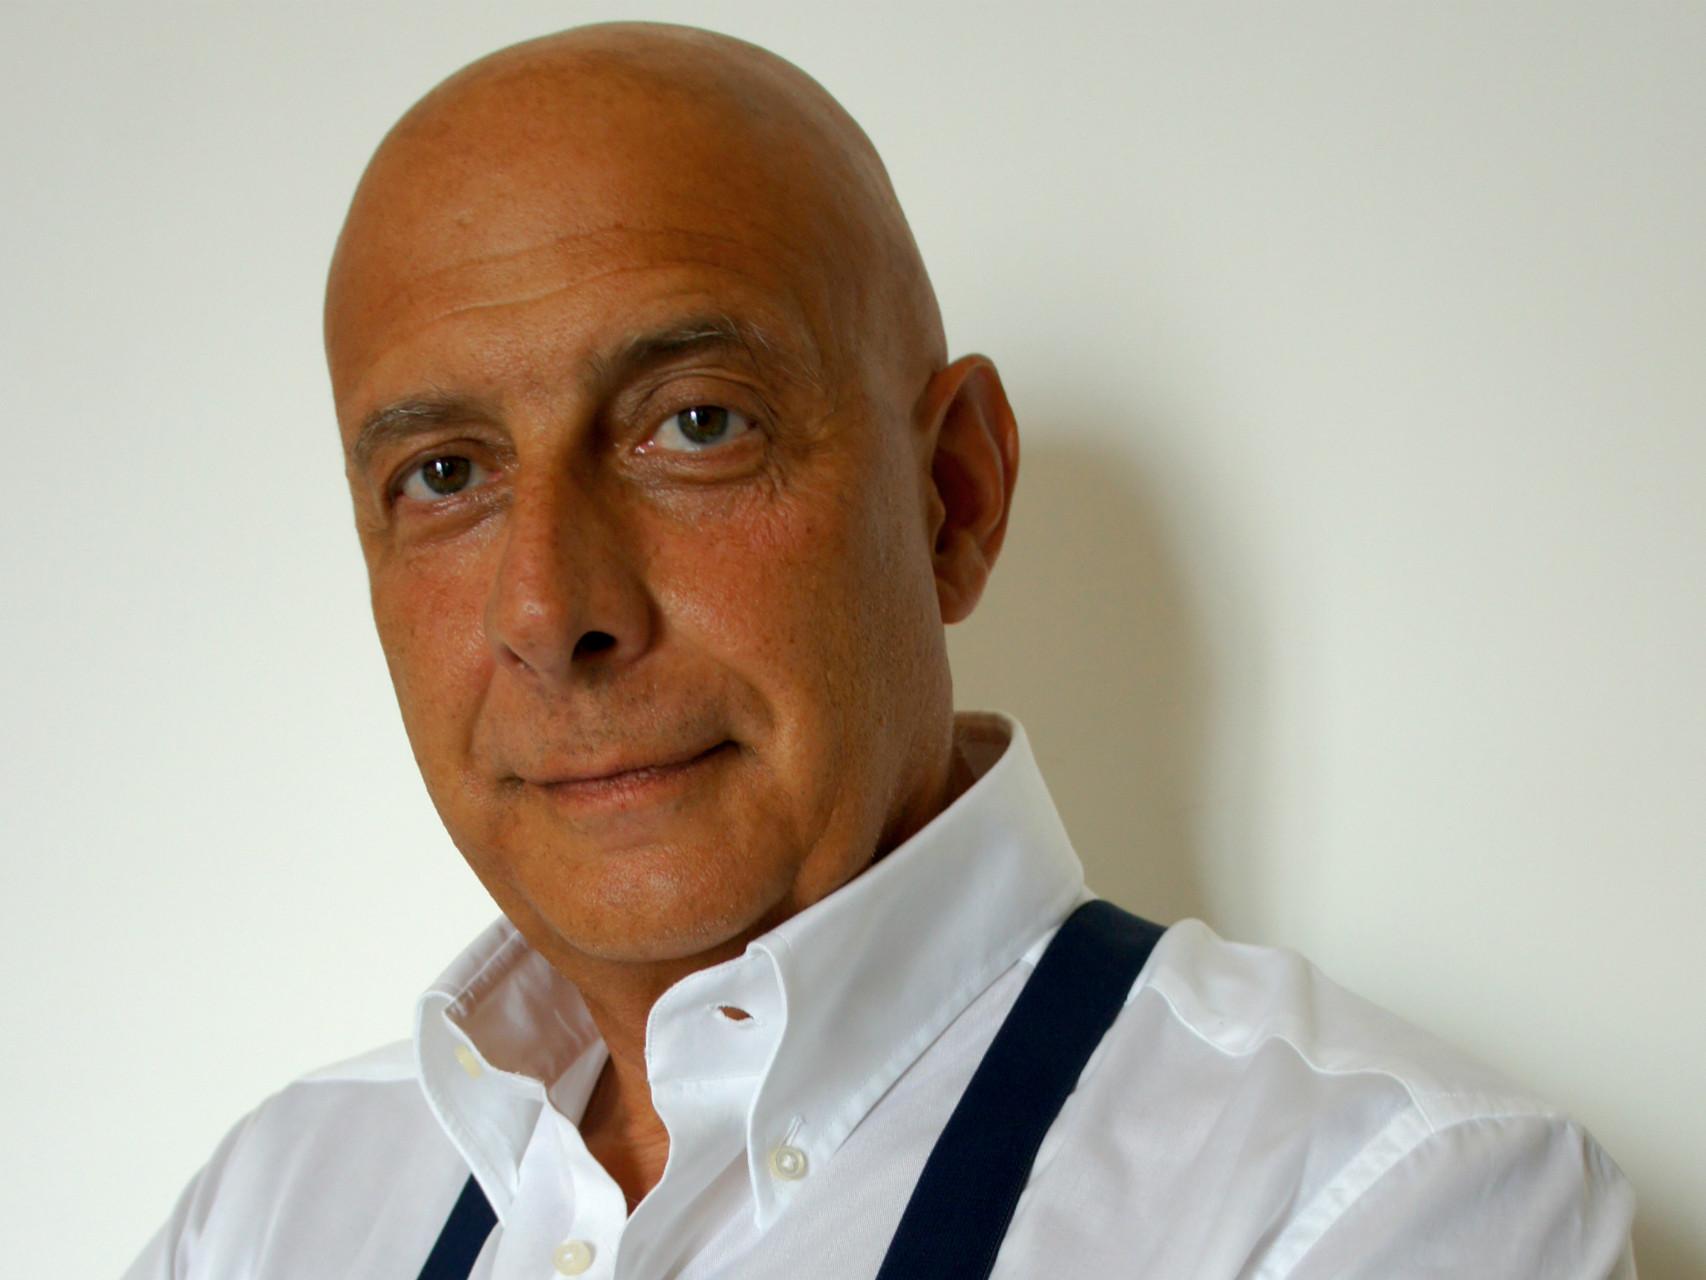 Luigi Bartalini